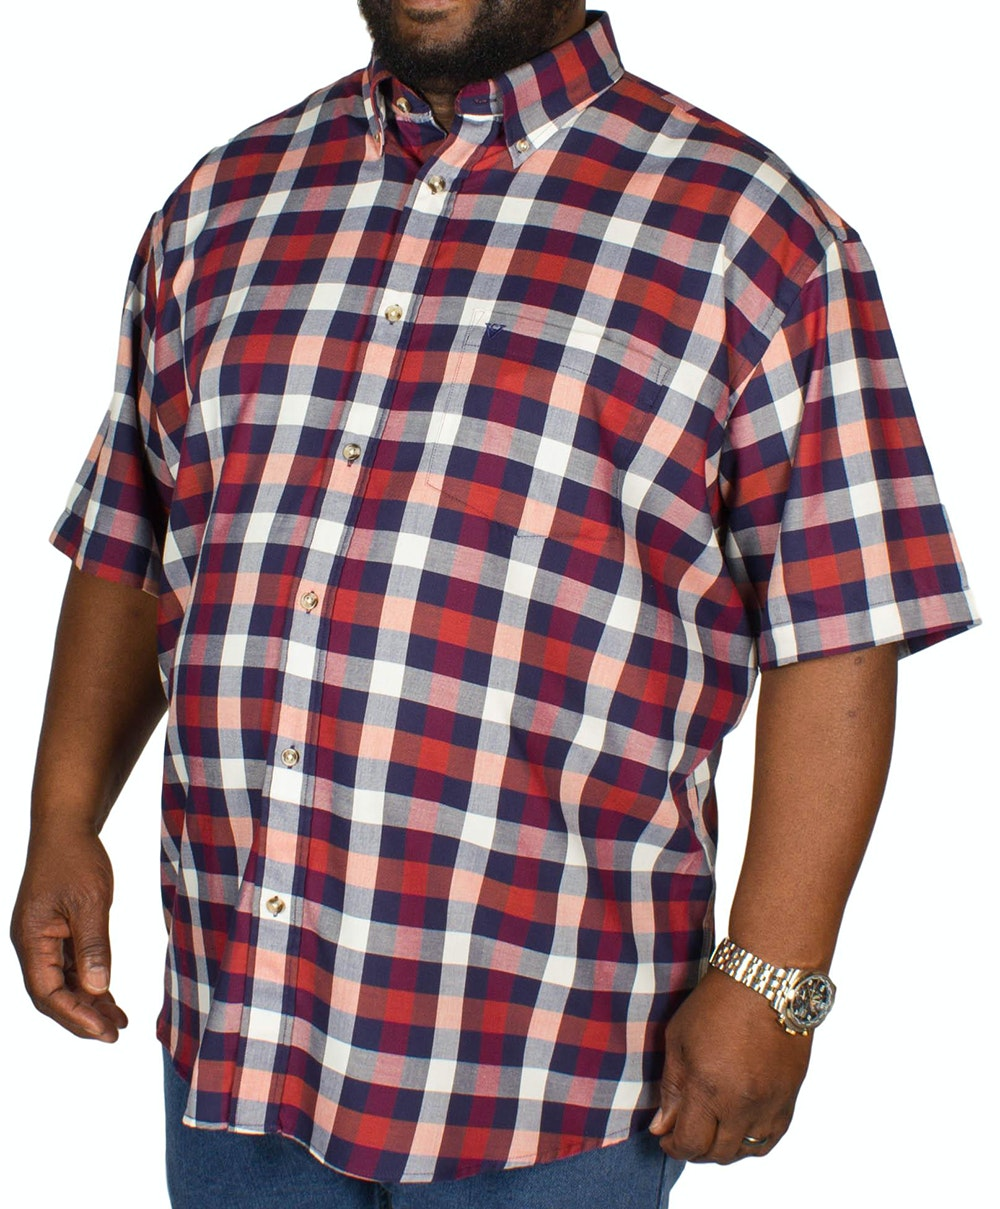 Cotton Valley Check Short Sleeve Shirt Amber/Navy